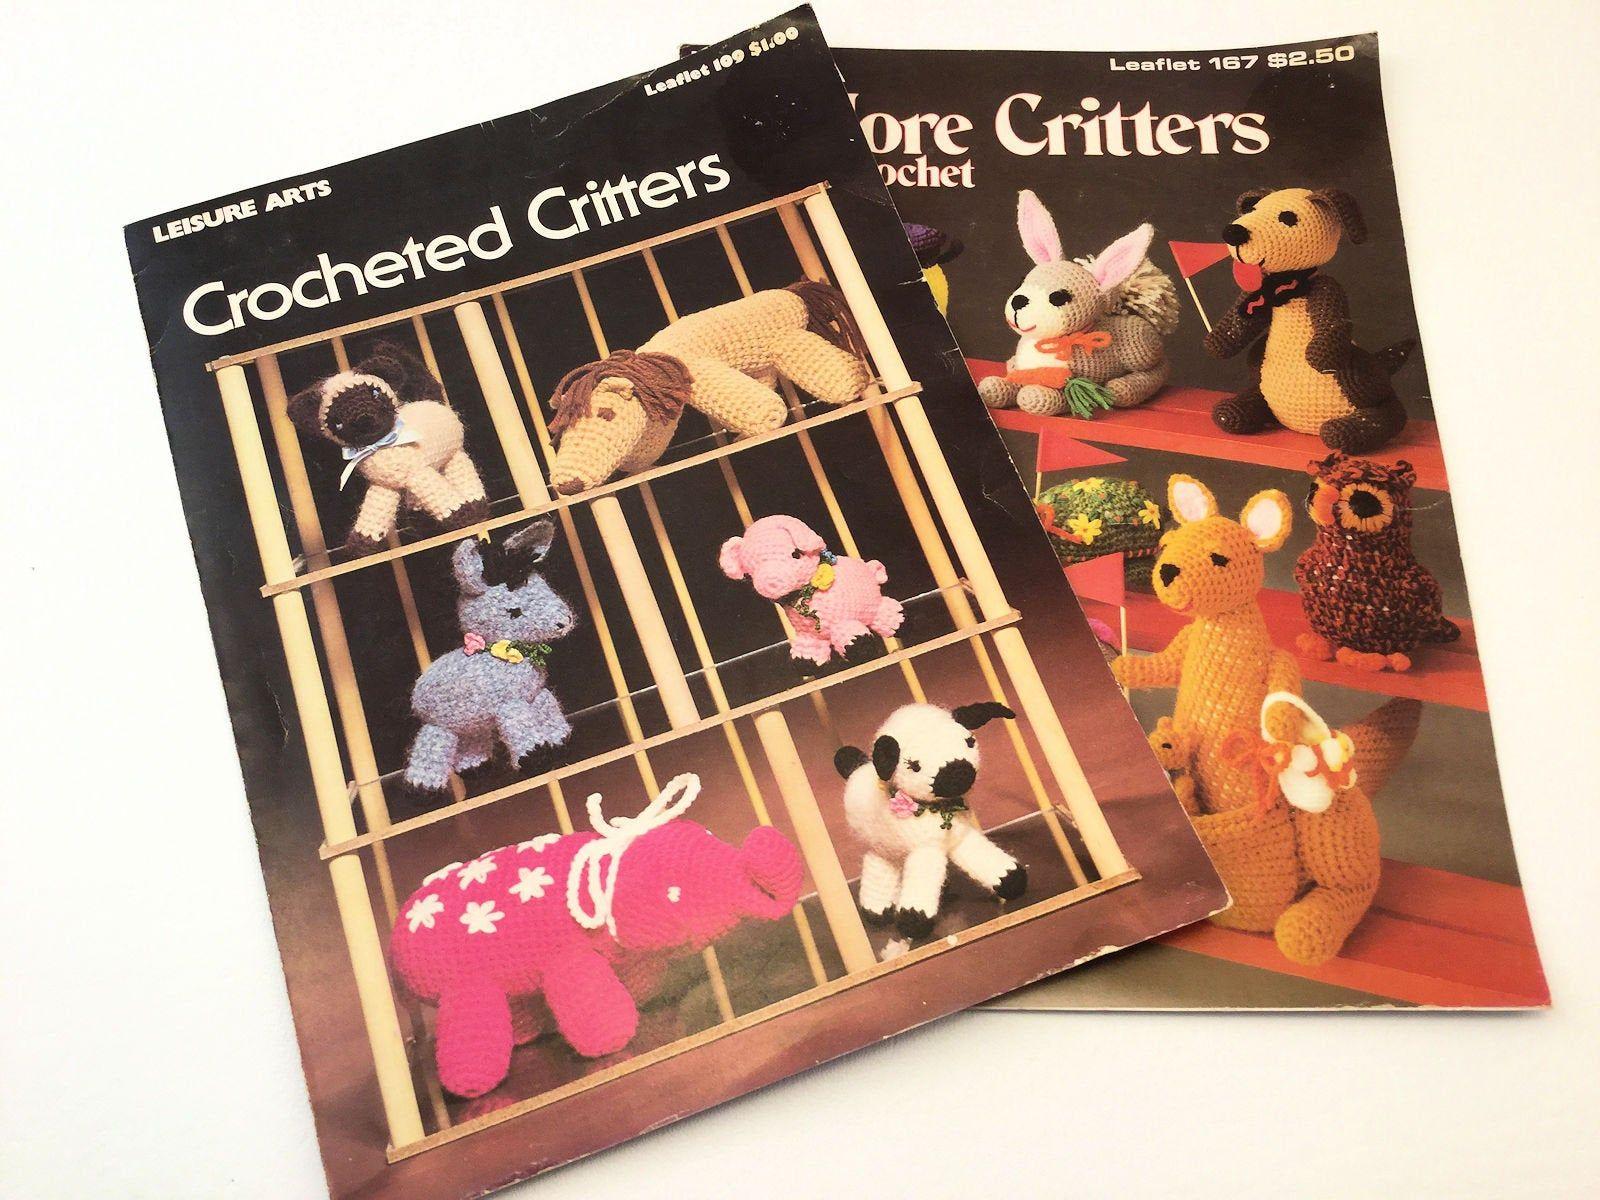 Crochet Critters, Leisure Arts 109, Leisure Arts 167, Animal Patterns, Crochet Animals, Giraffe Pattern, Kangaroo Pattern, Crochet Sheep